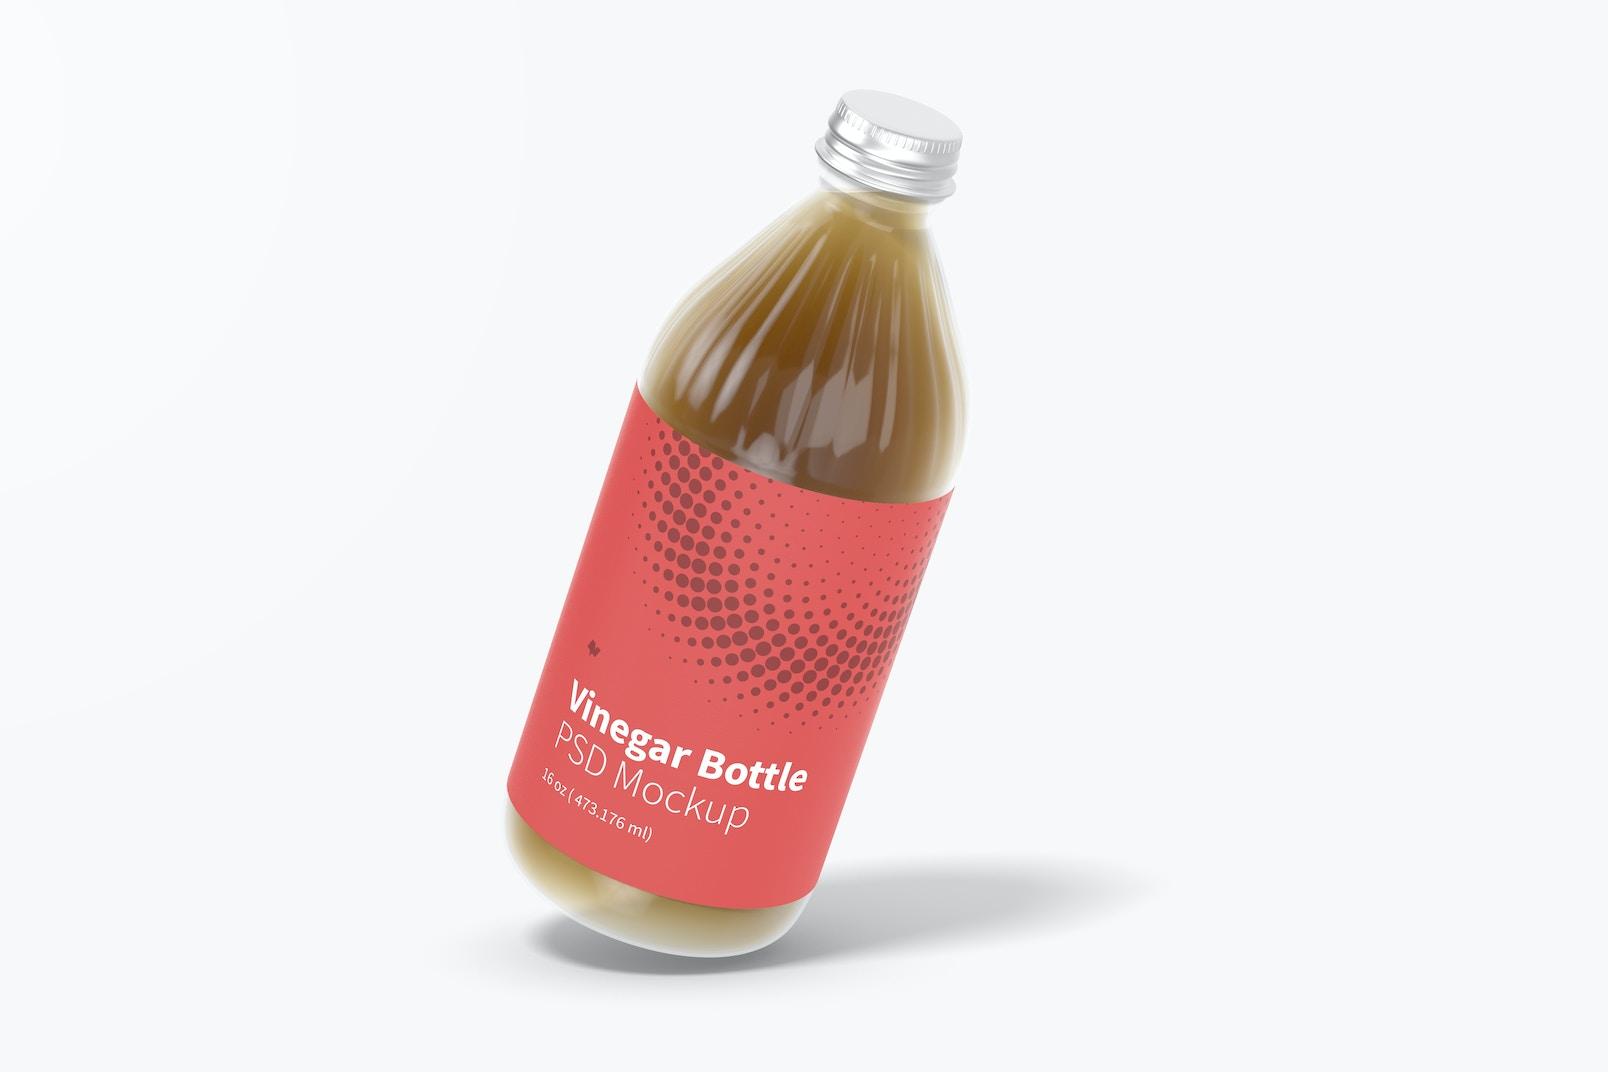 16 oz Glass Vinegar Bottle Mockup, Floating